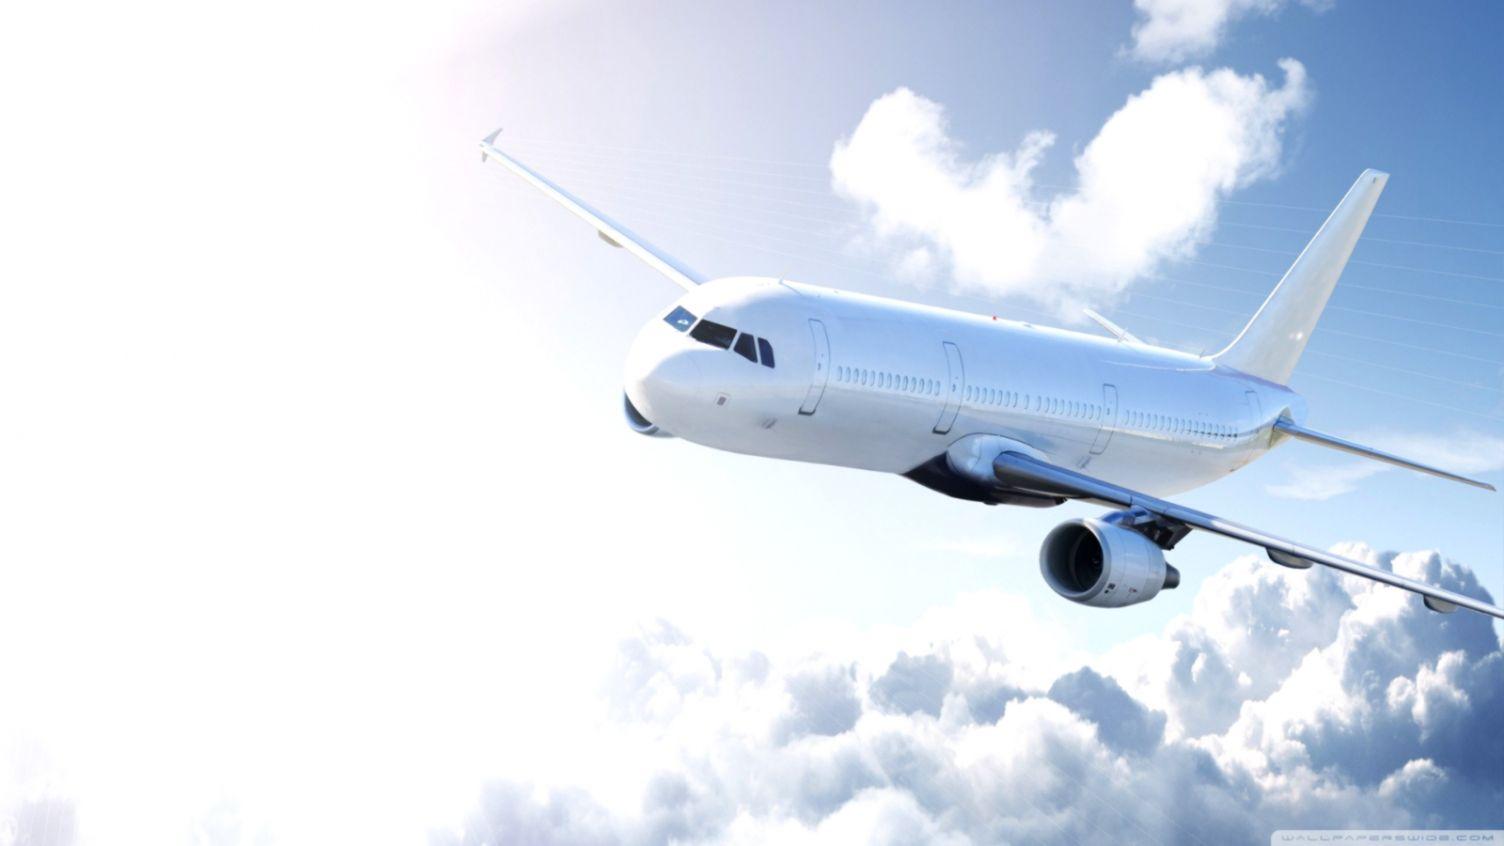 Bringing Vape on Airplane